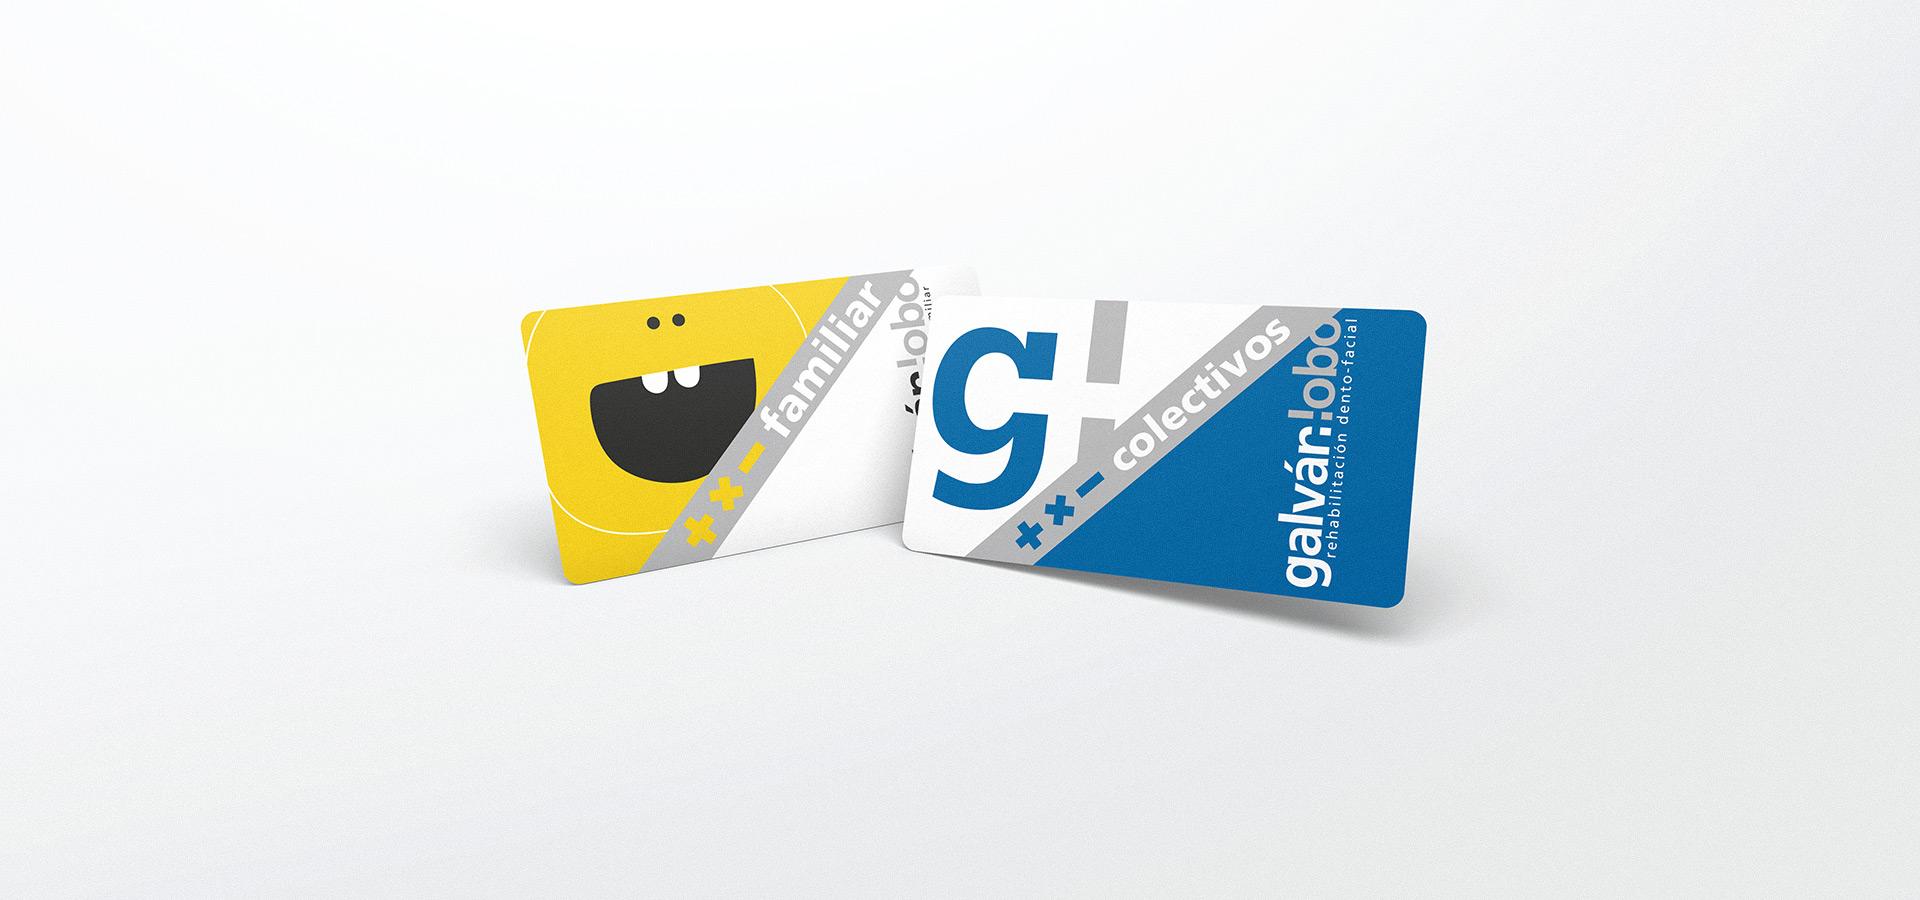 Tarjeta de fidelización Clínica Galván Lobo. Financiación